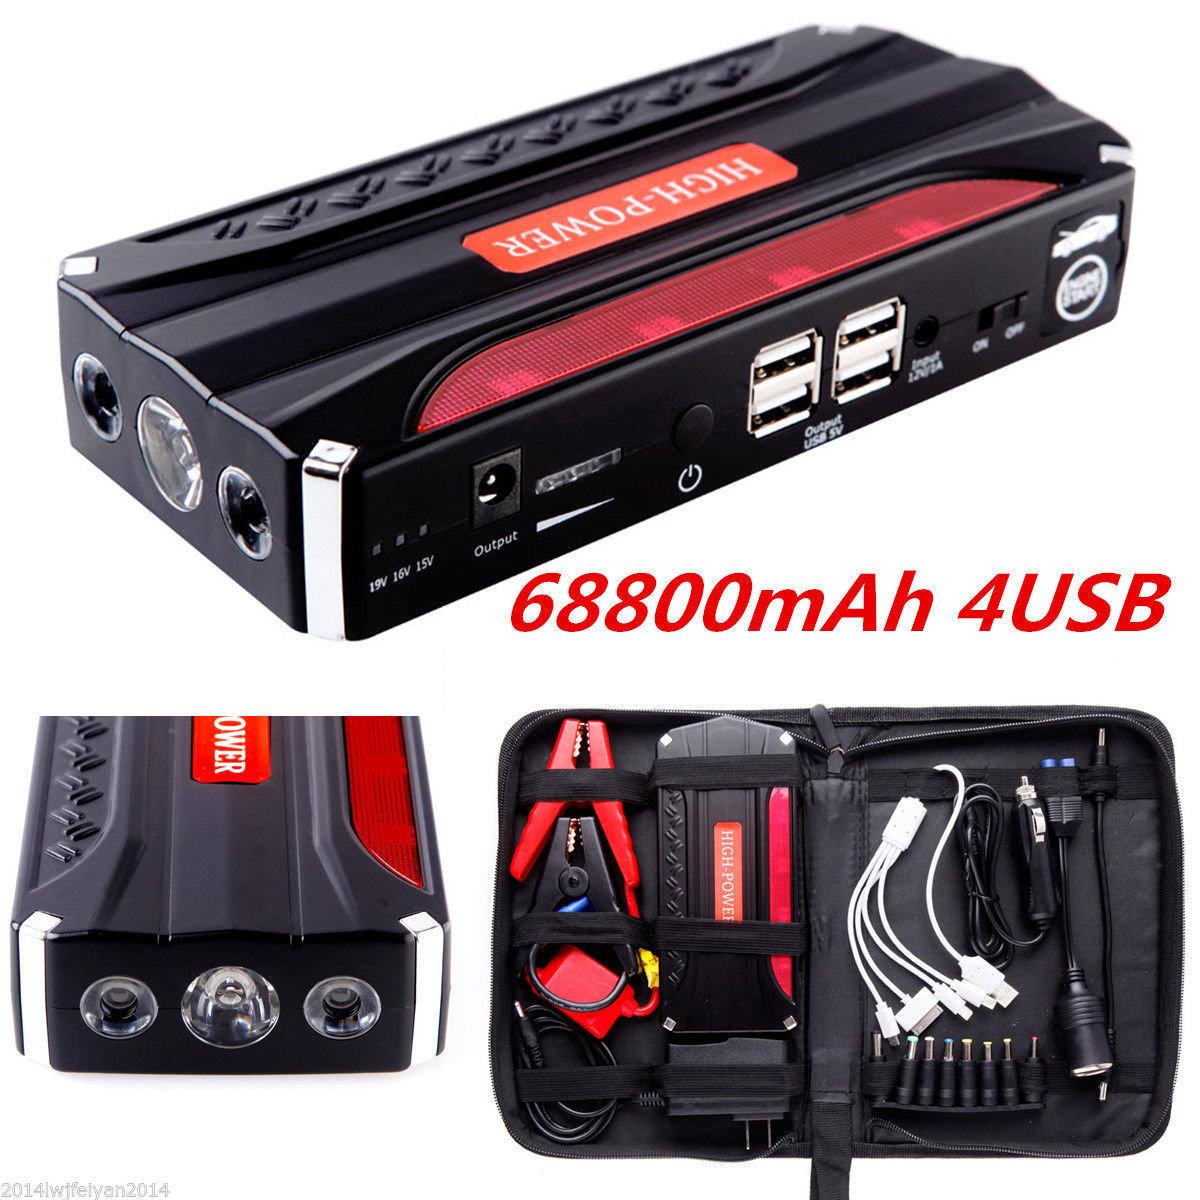 68800mAh Portable Car Jump Starter Pack Booster Battery Charger 4 USB Power Bank